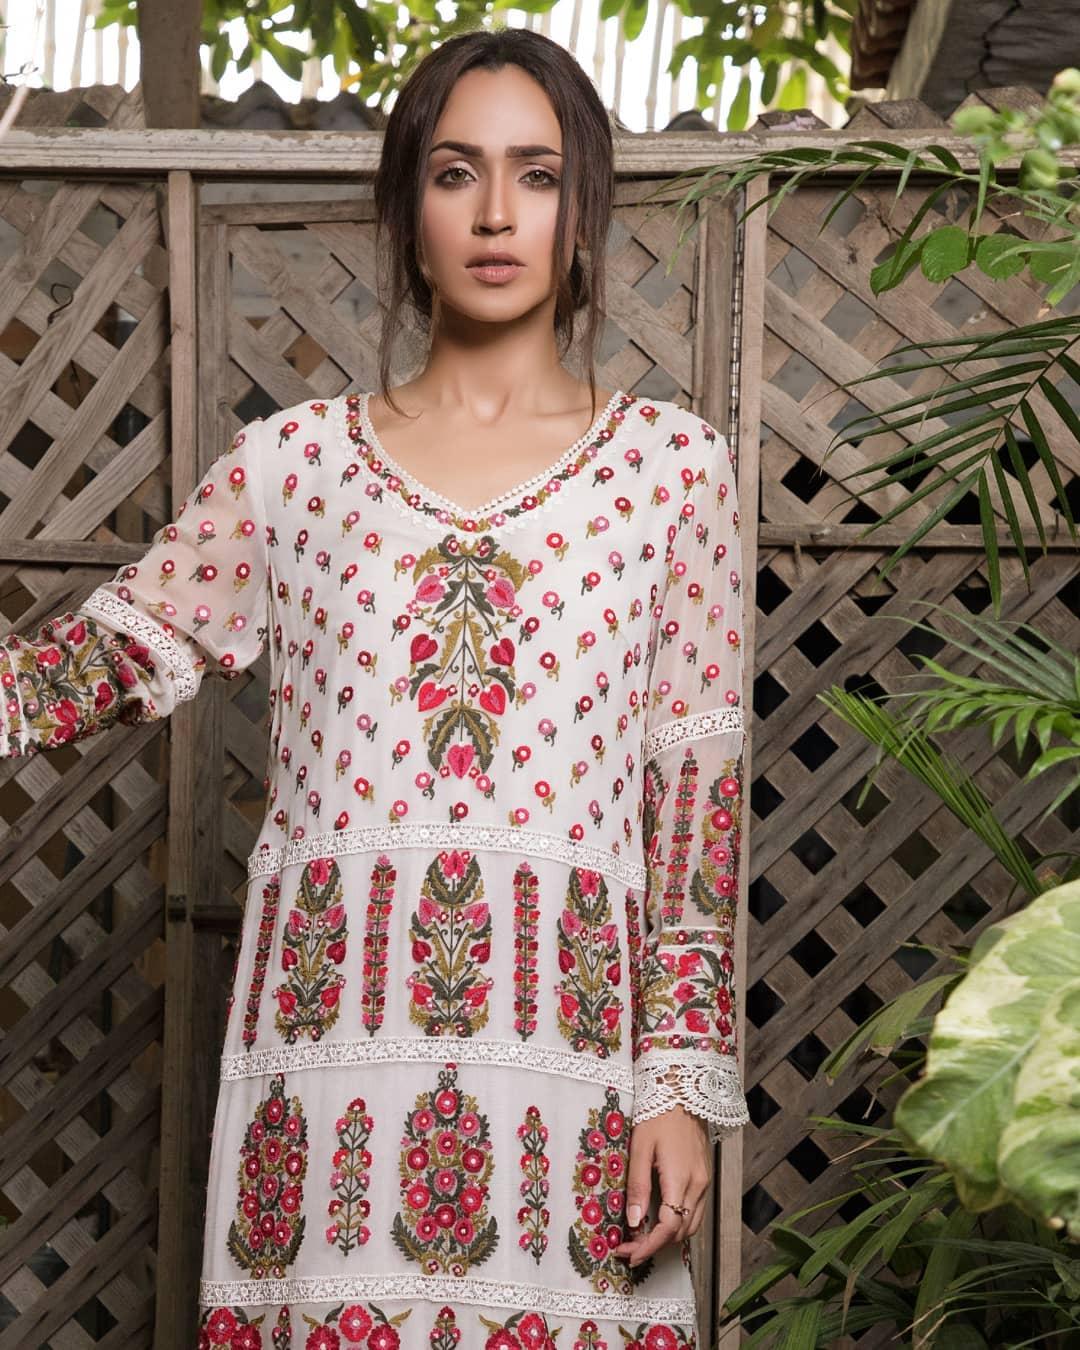 Faryal Mehmood Looking Beautiful in her Latest Photo Shoot